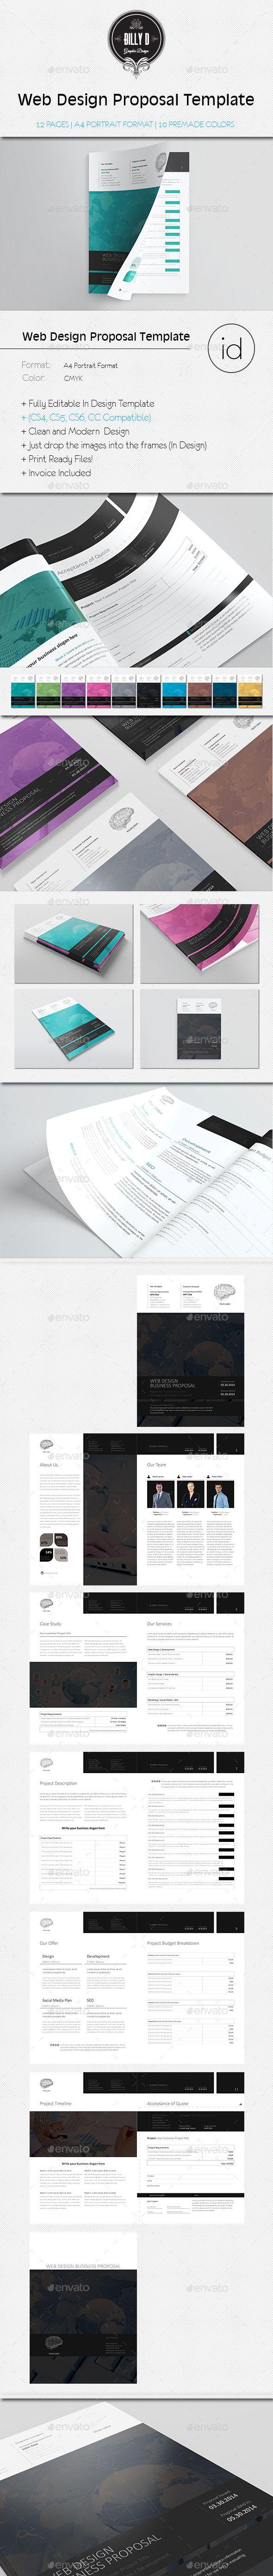 agency proposal template%0A Web Design Proposal Template    invoice  invoicetemplate   Download  http